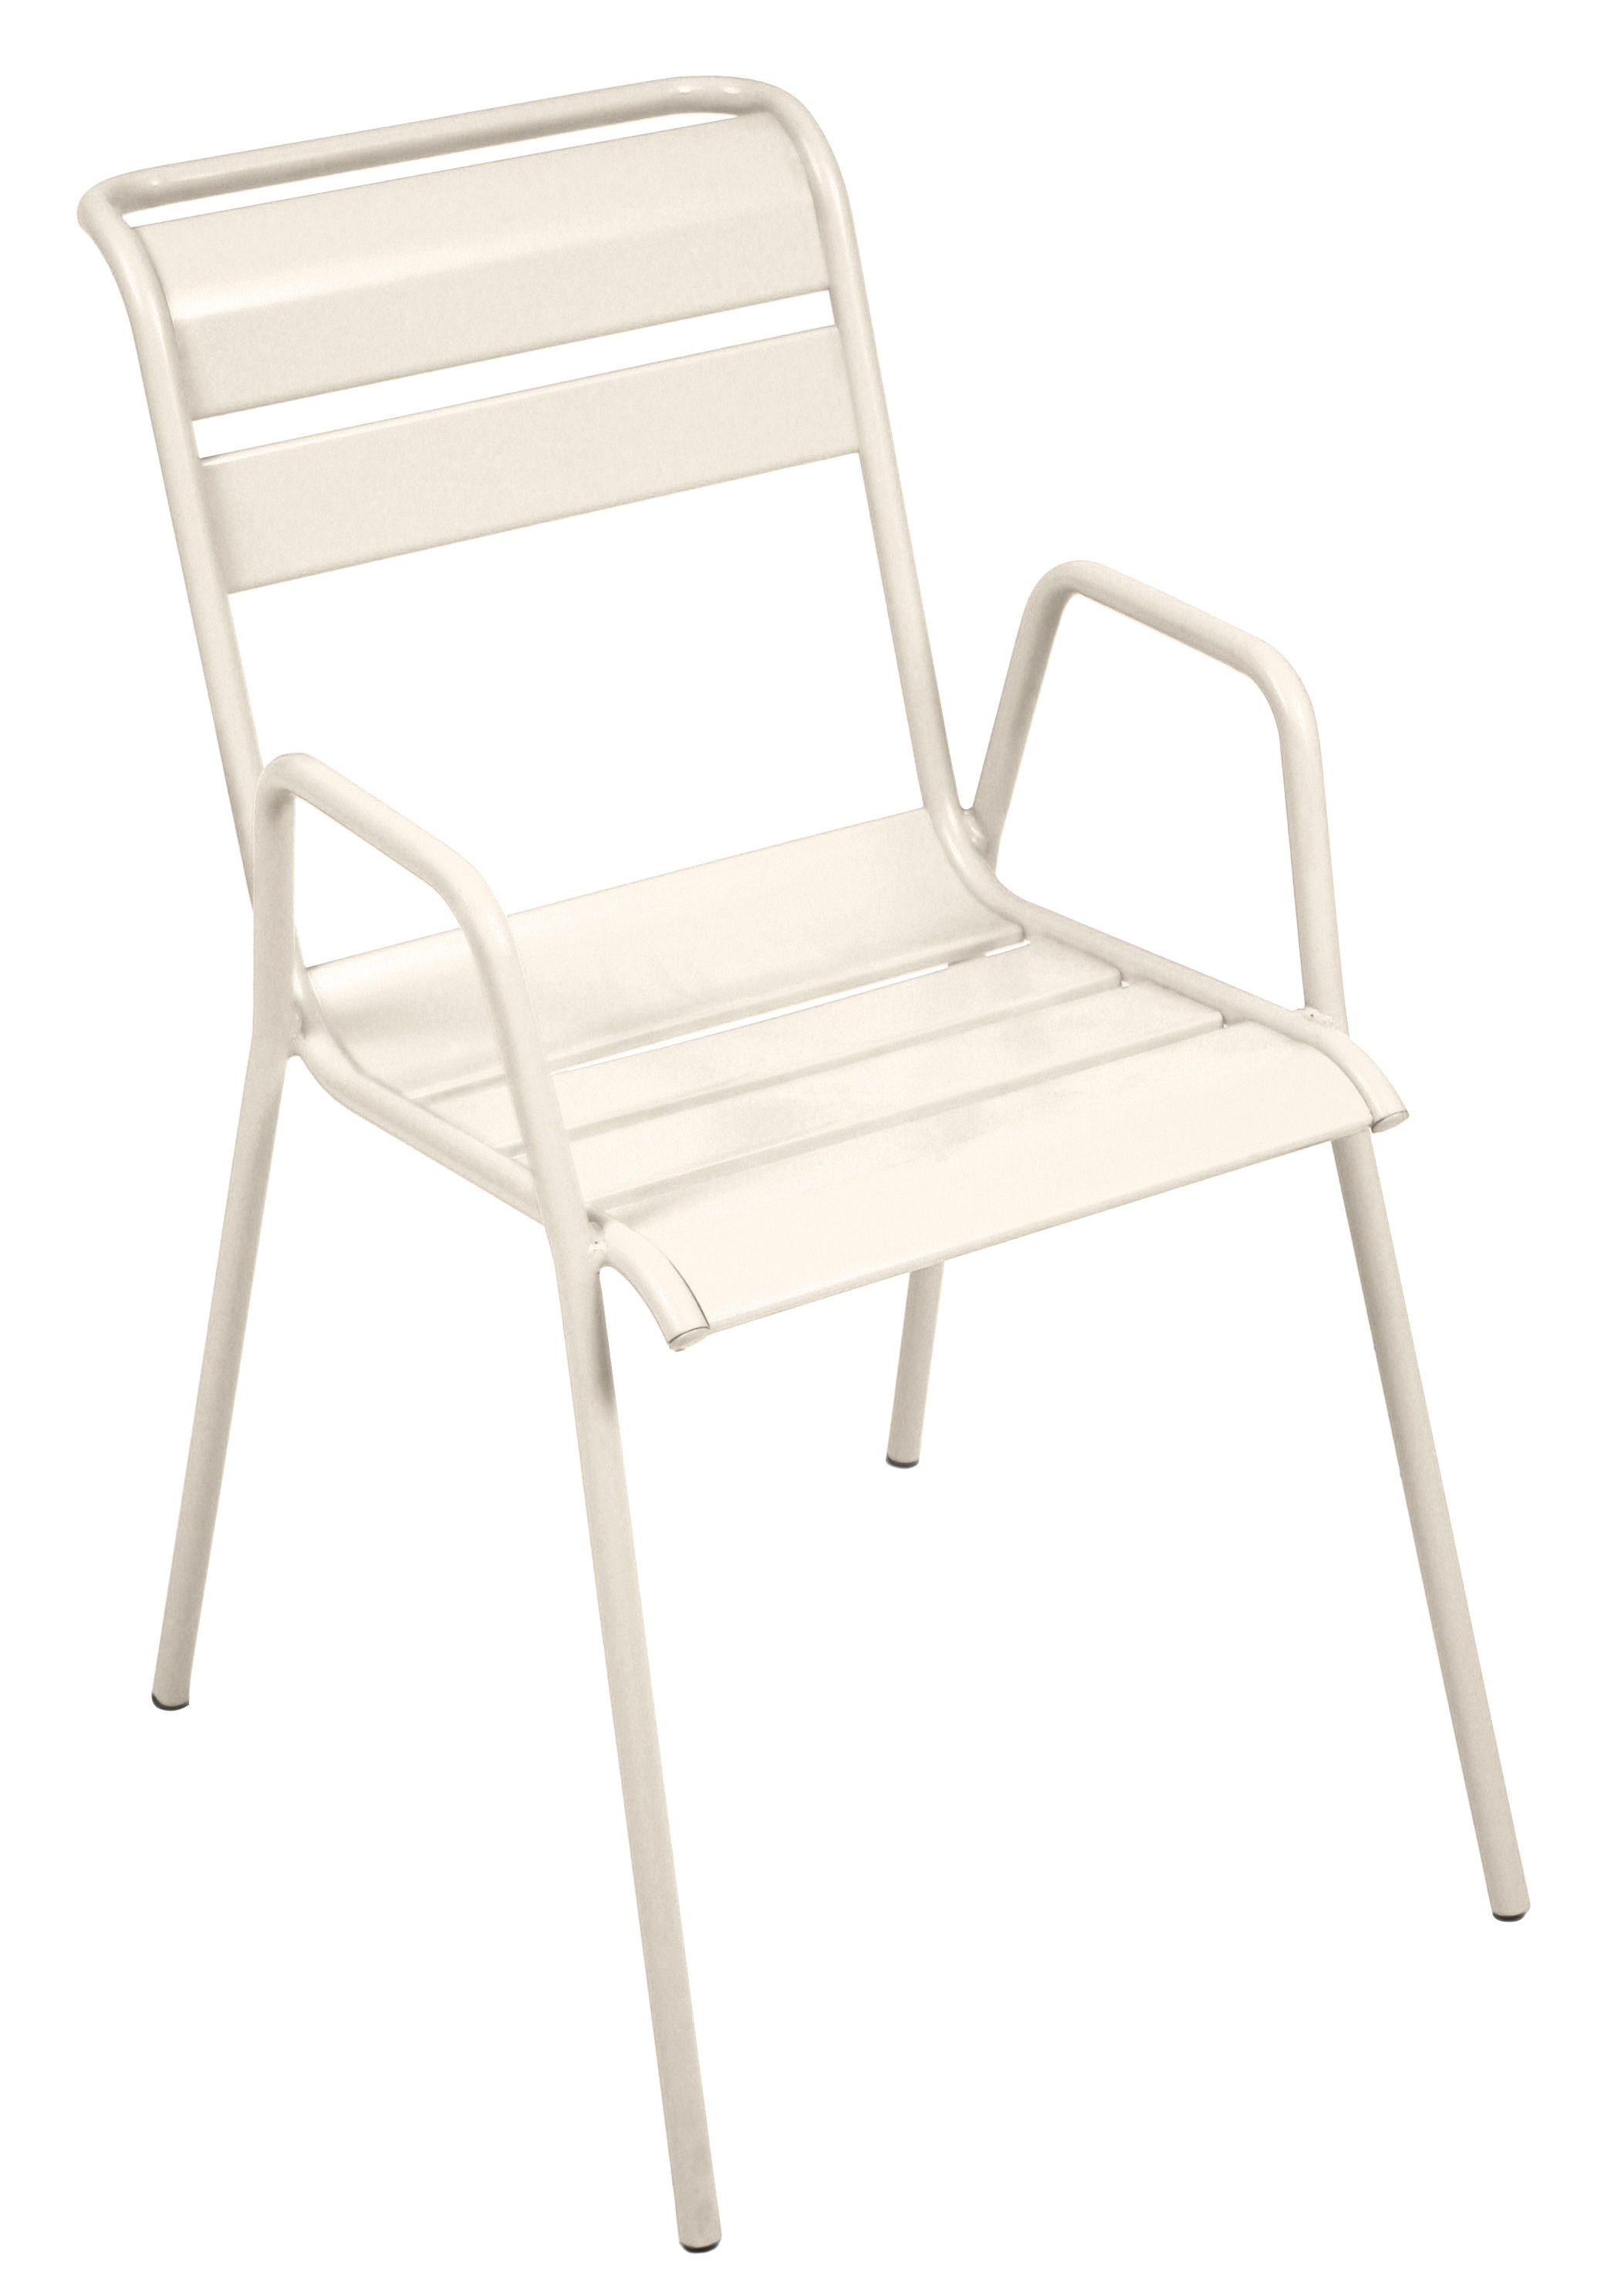 fauteuil empilable monceau m tal lin fermob. Black Bedroom Furniture Sets. Home Design Ideas